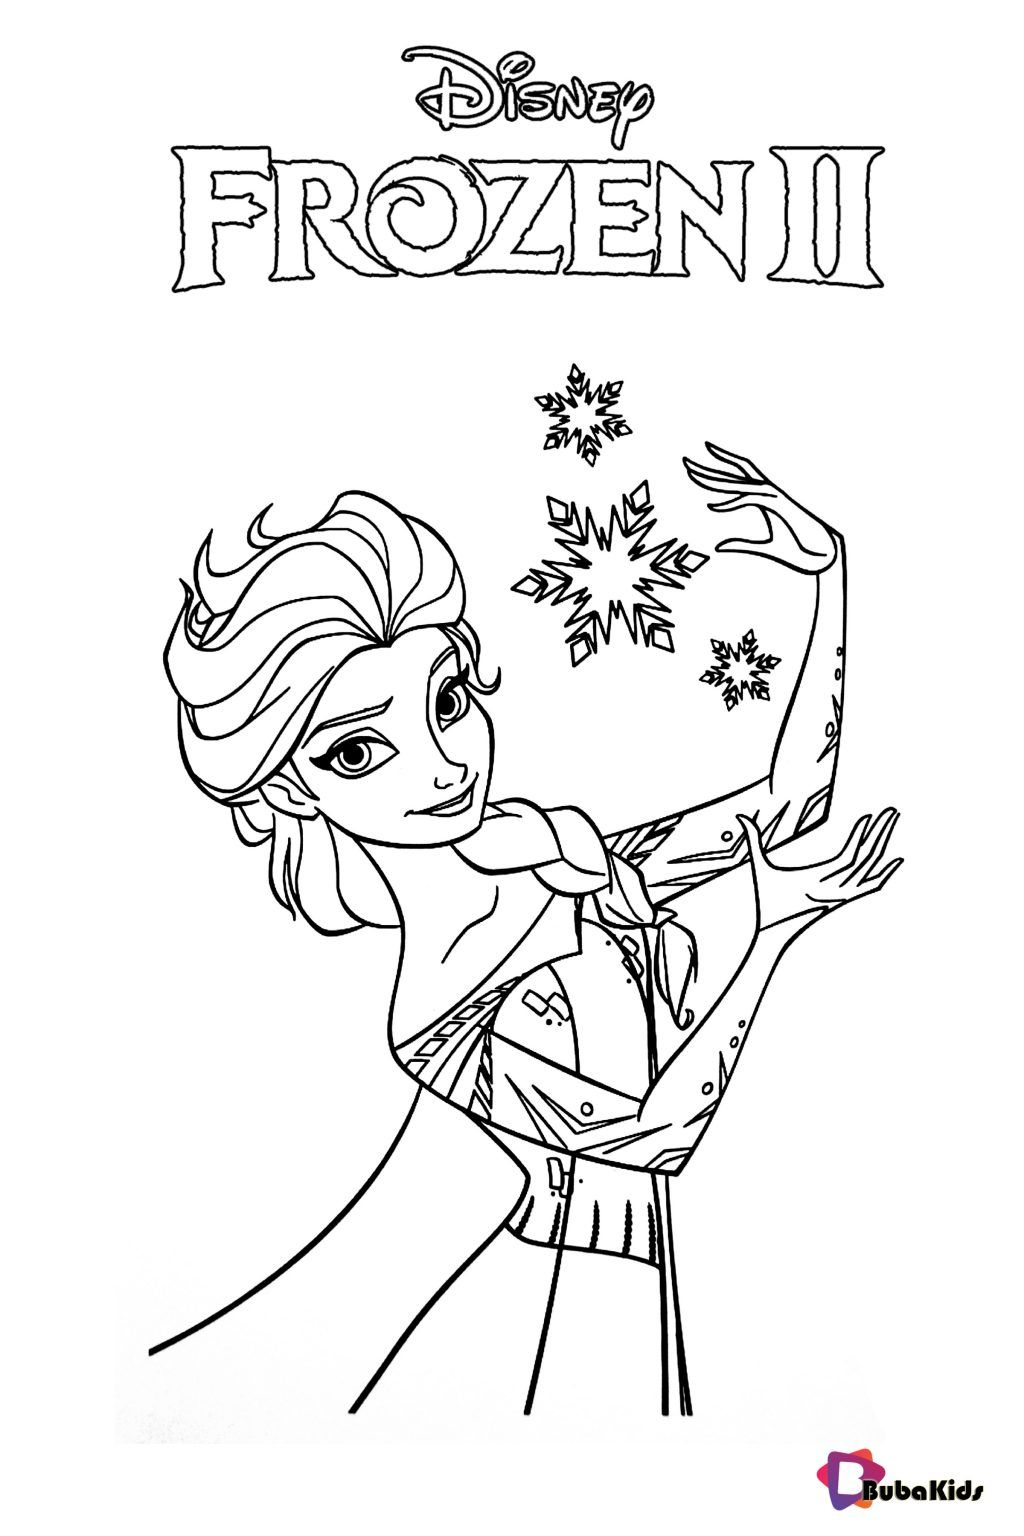 Frozen 2 Queen Elsa Coloring Page Bubakids Bubakids Com Bubakids Com In 2020 Elsa Coloring Pages Dance Coloring Pages Frozen Coloring Pages